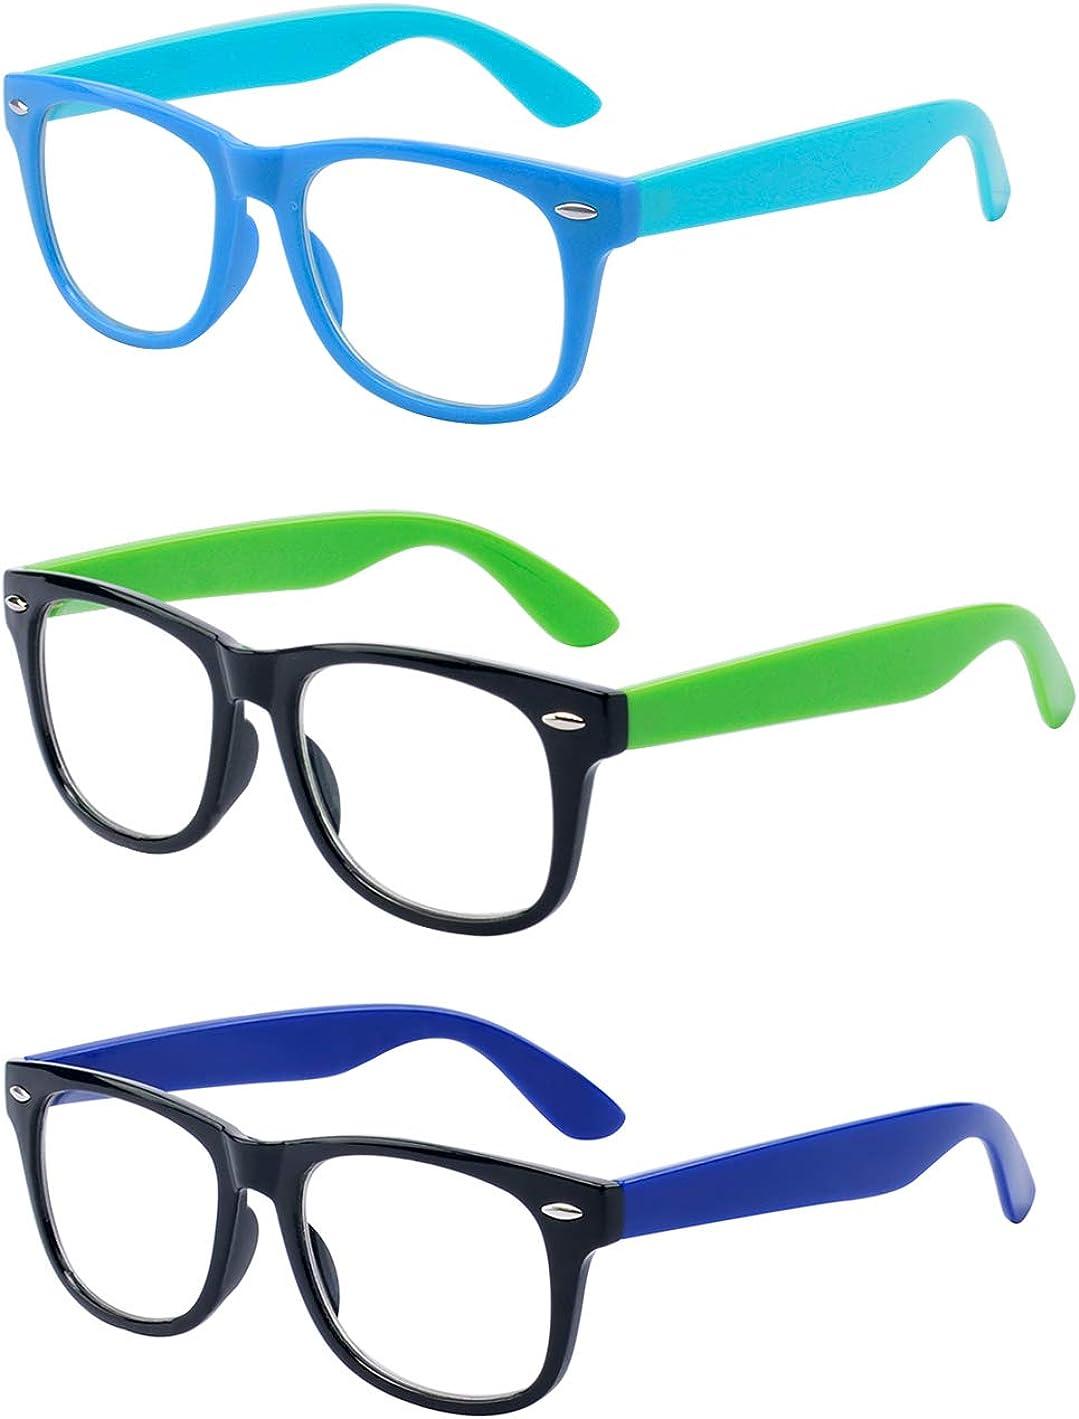 NEW Funky Party Fashion Retro Style Nerd White Pink Black Lens Sunglasses Glass